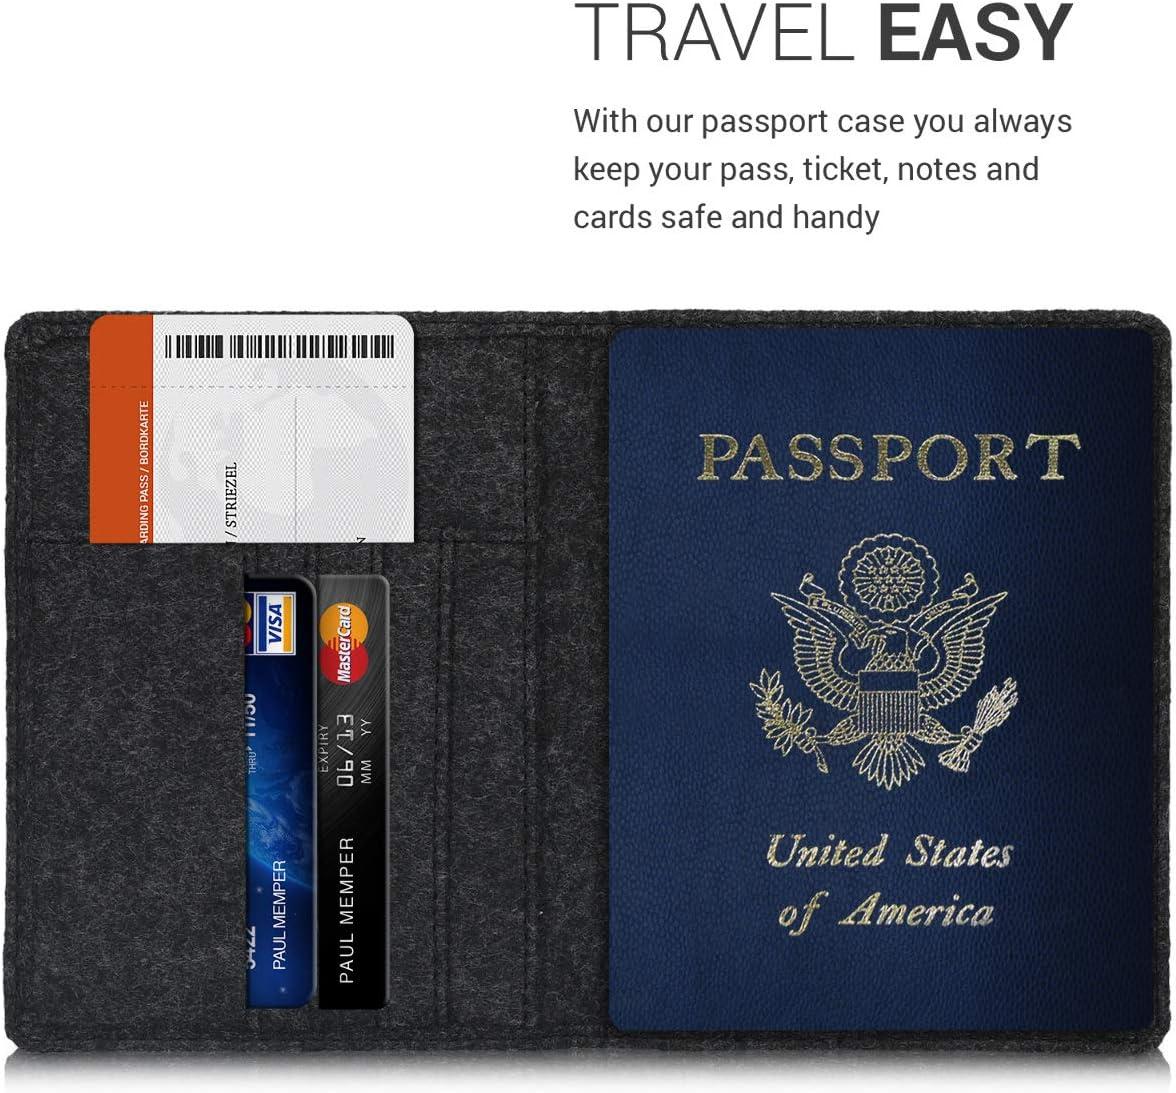 Felt Passport Cover Protective Case Travel Wallet for Men /& Women kwmobile Passport Holder with Card Slots Felt Dark Grey